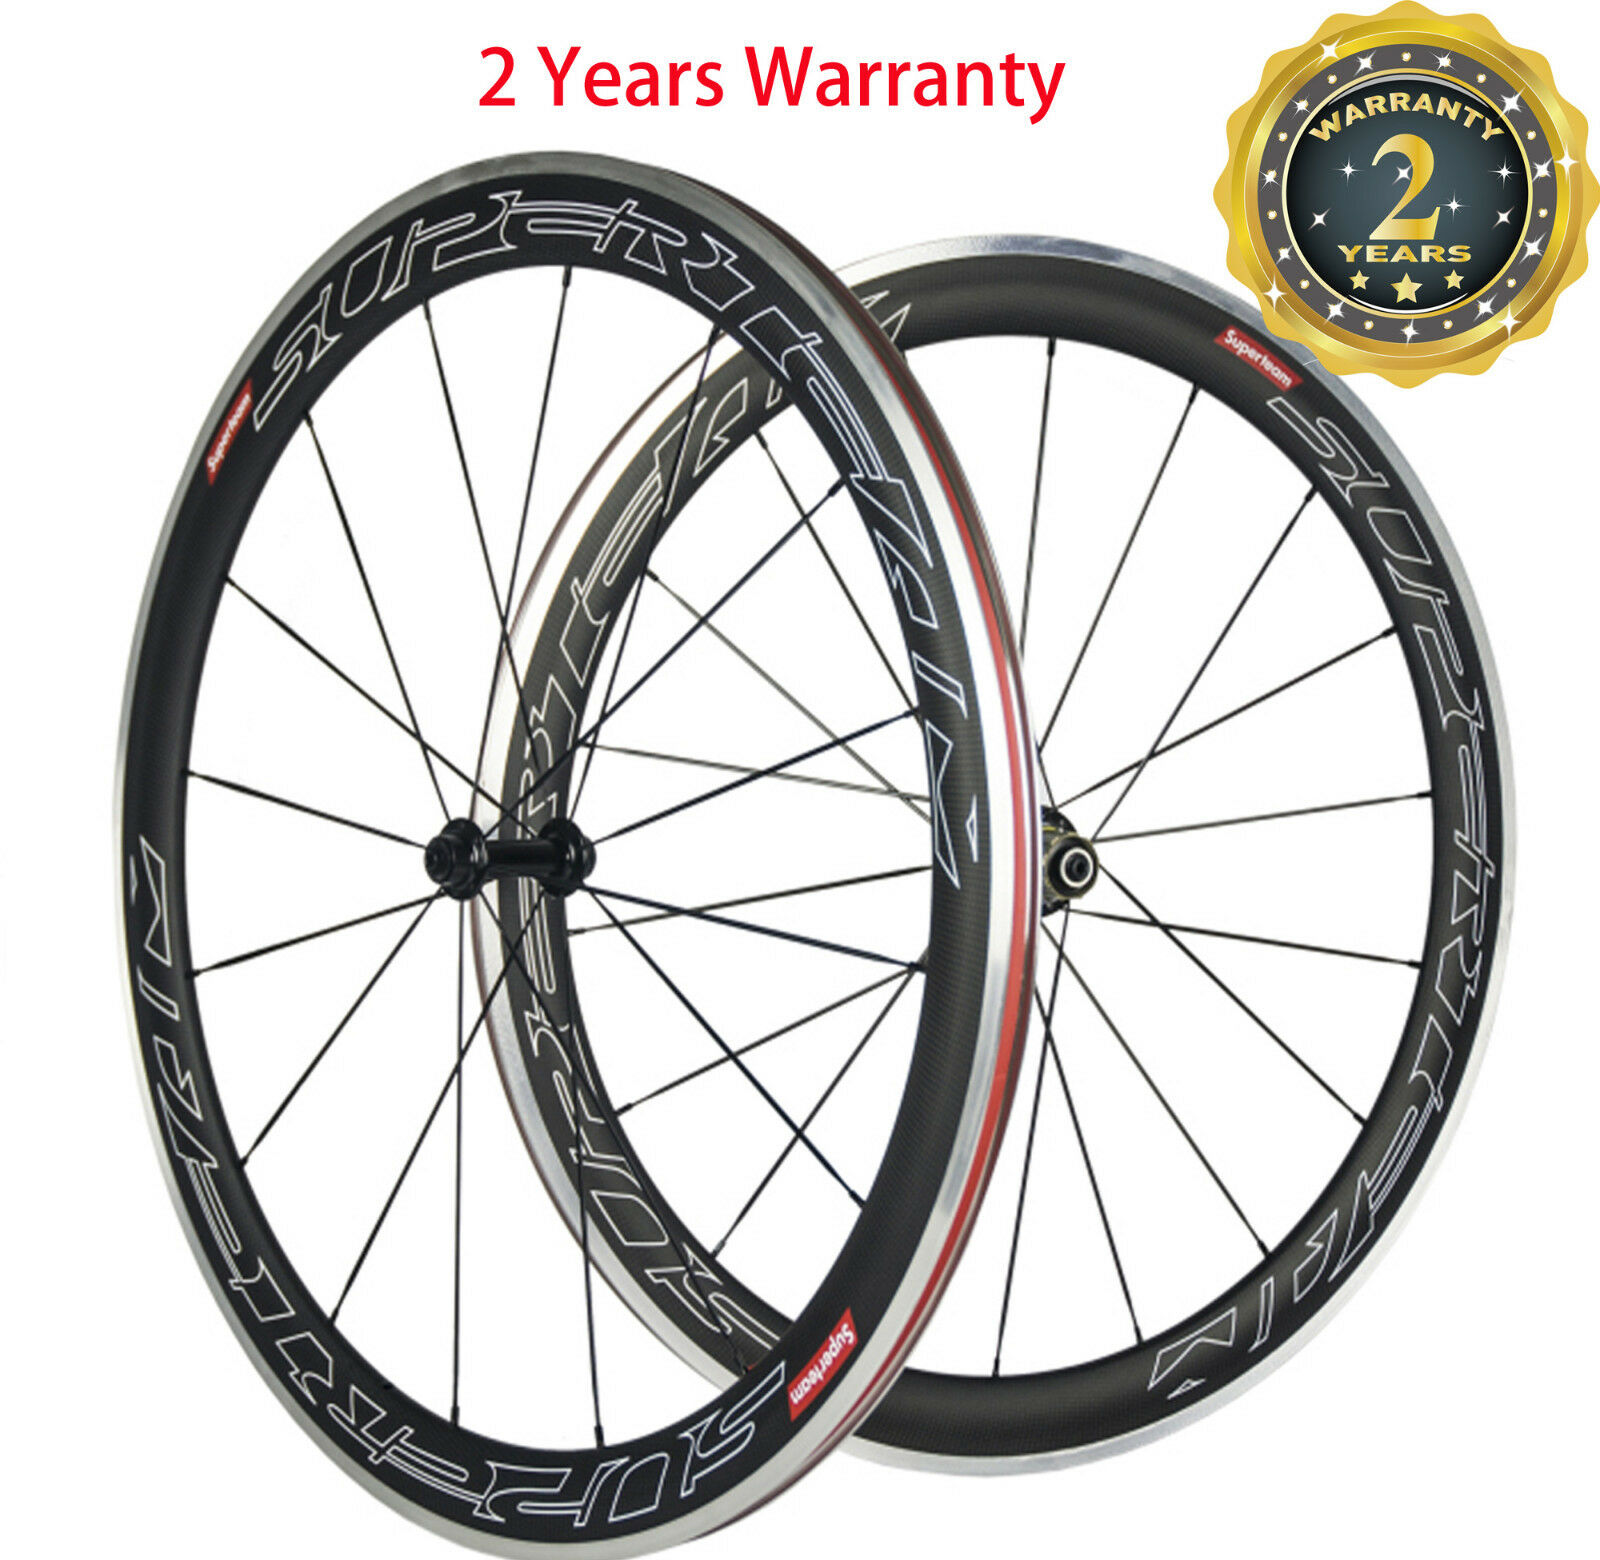 Superteam  50mm Aluminum Braking Carbon Wheelset 700C Bicycle Front&Rear Wheels  first-class service